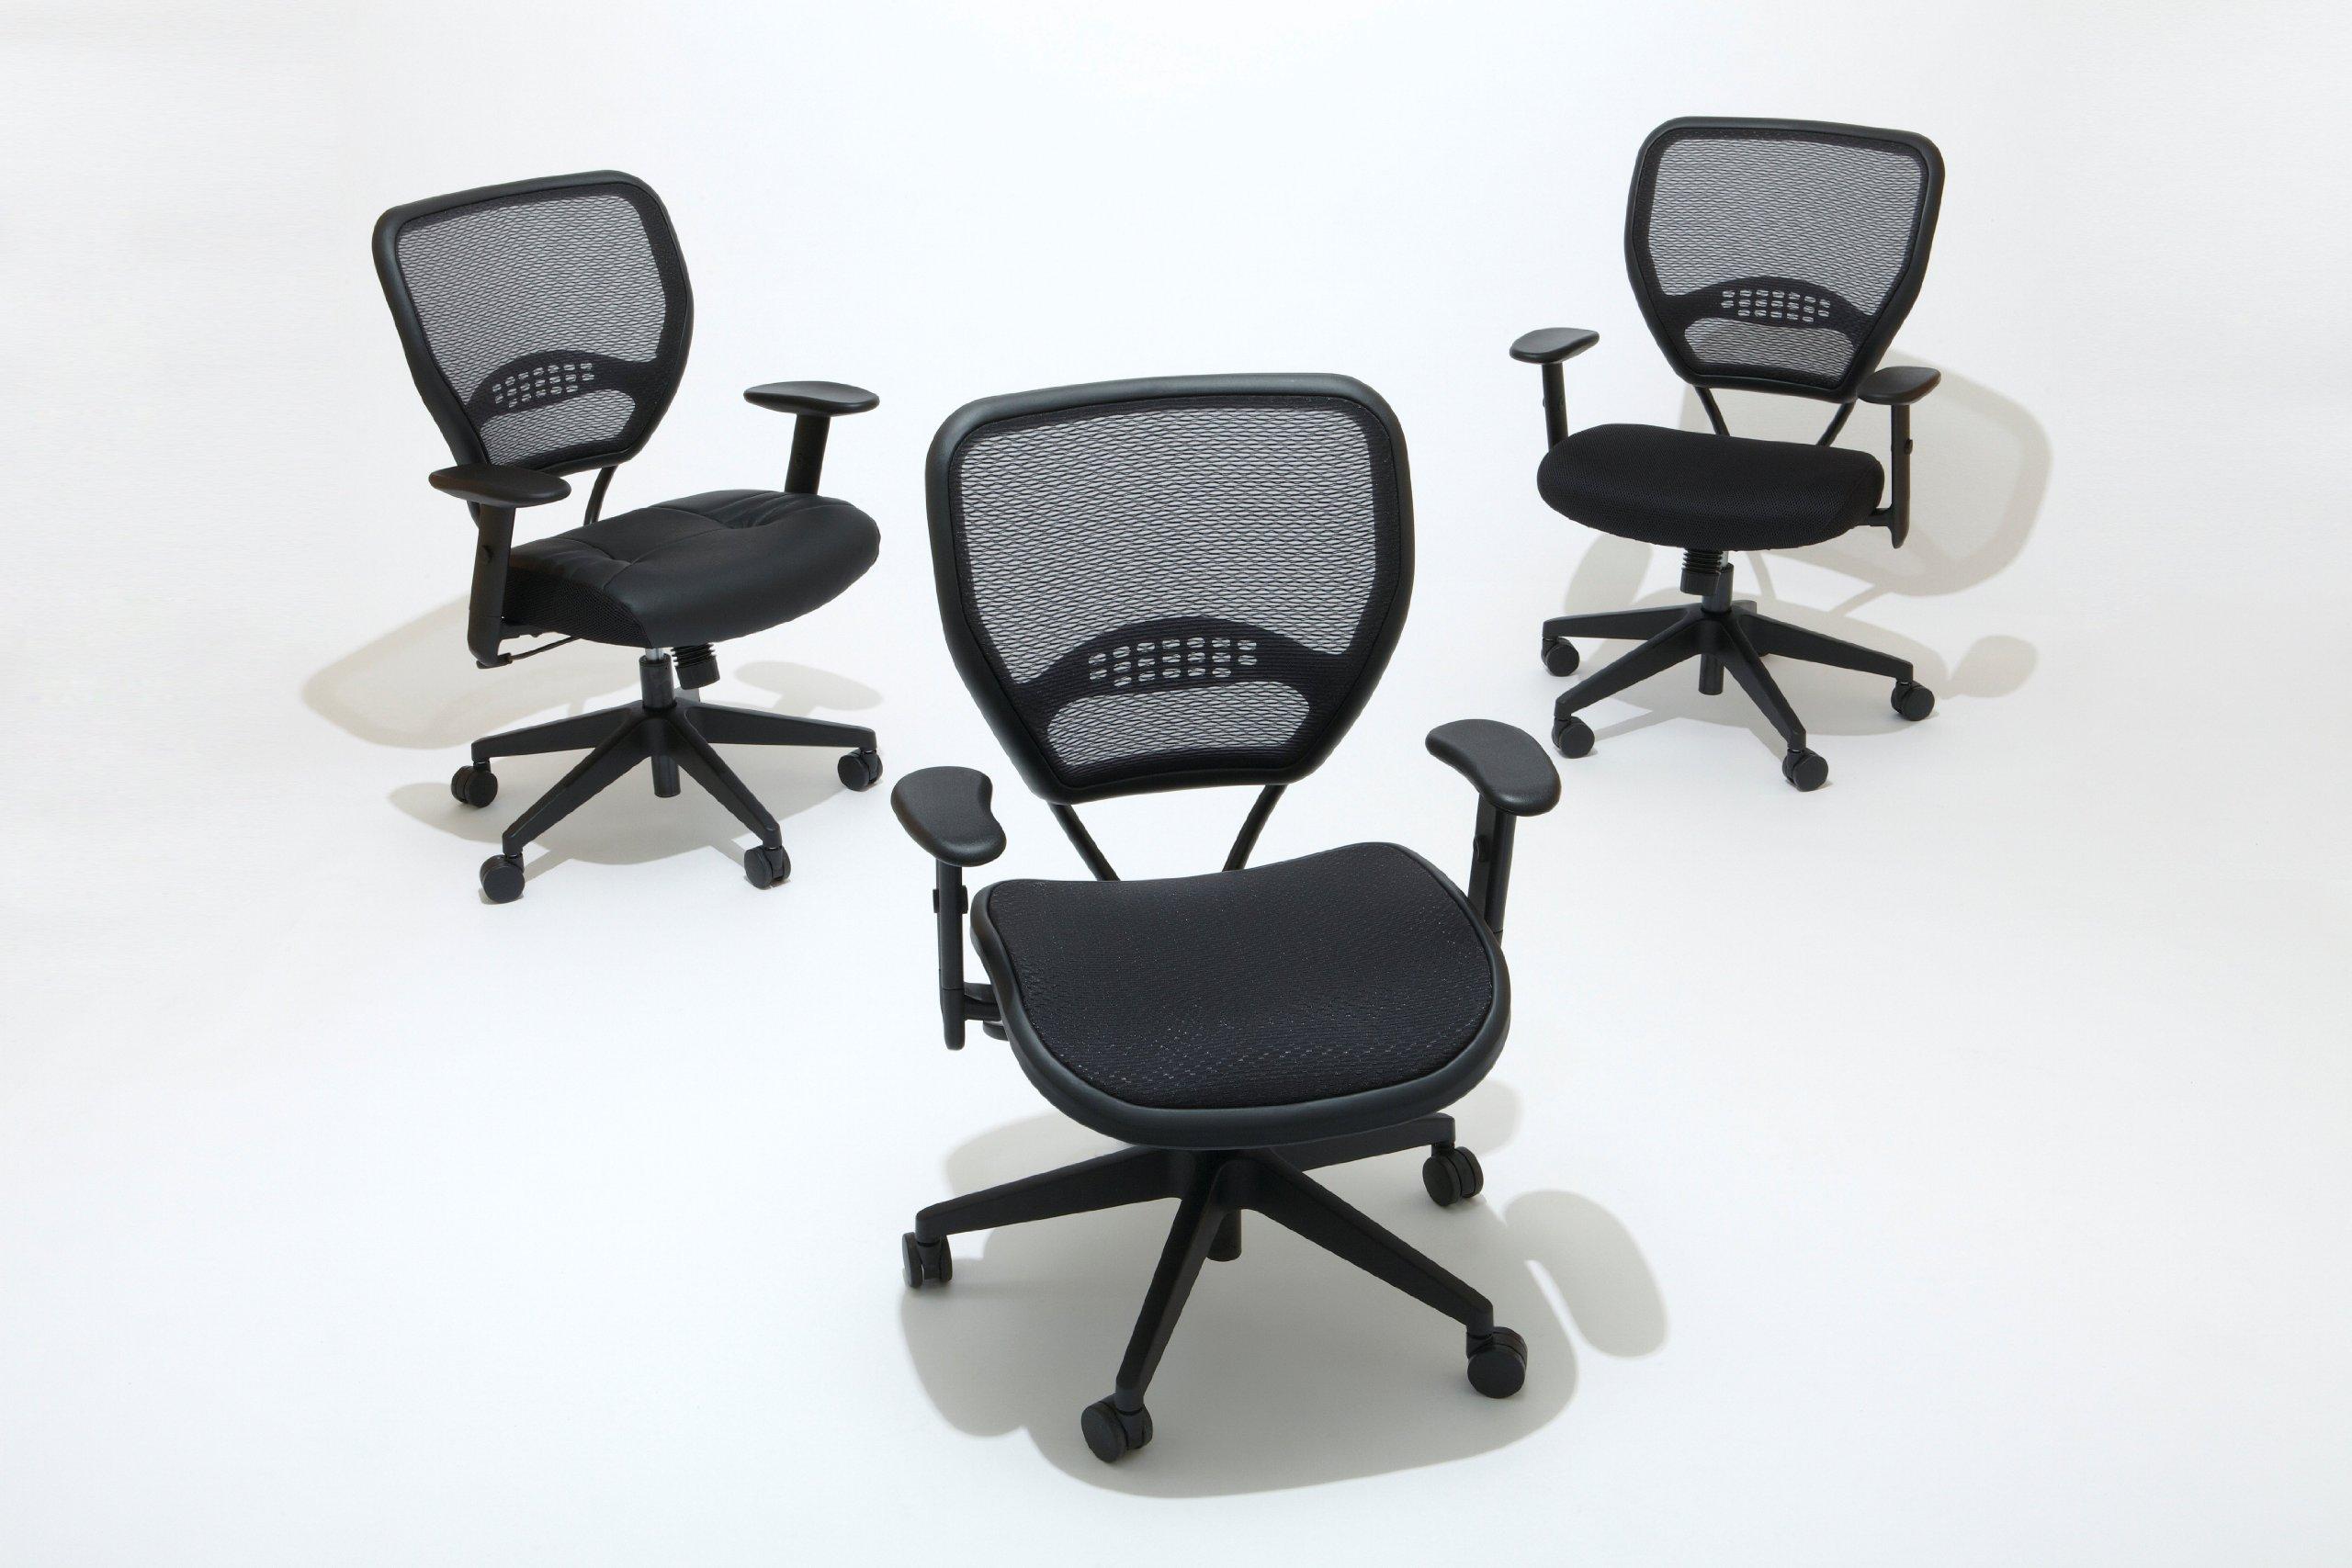 office star 5500 space air grid mid back swivel chair black 20 1